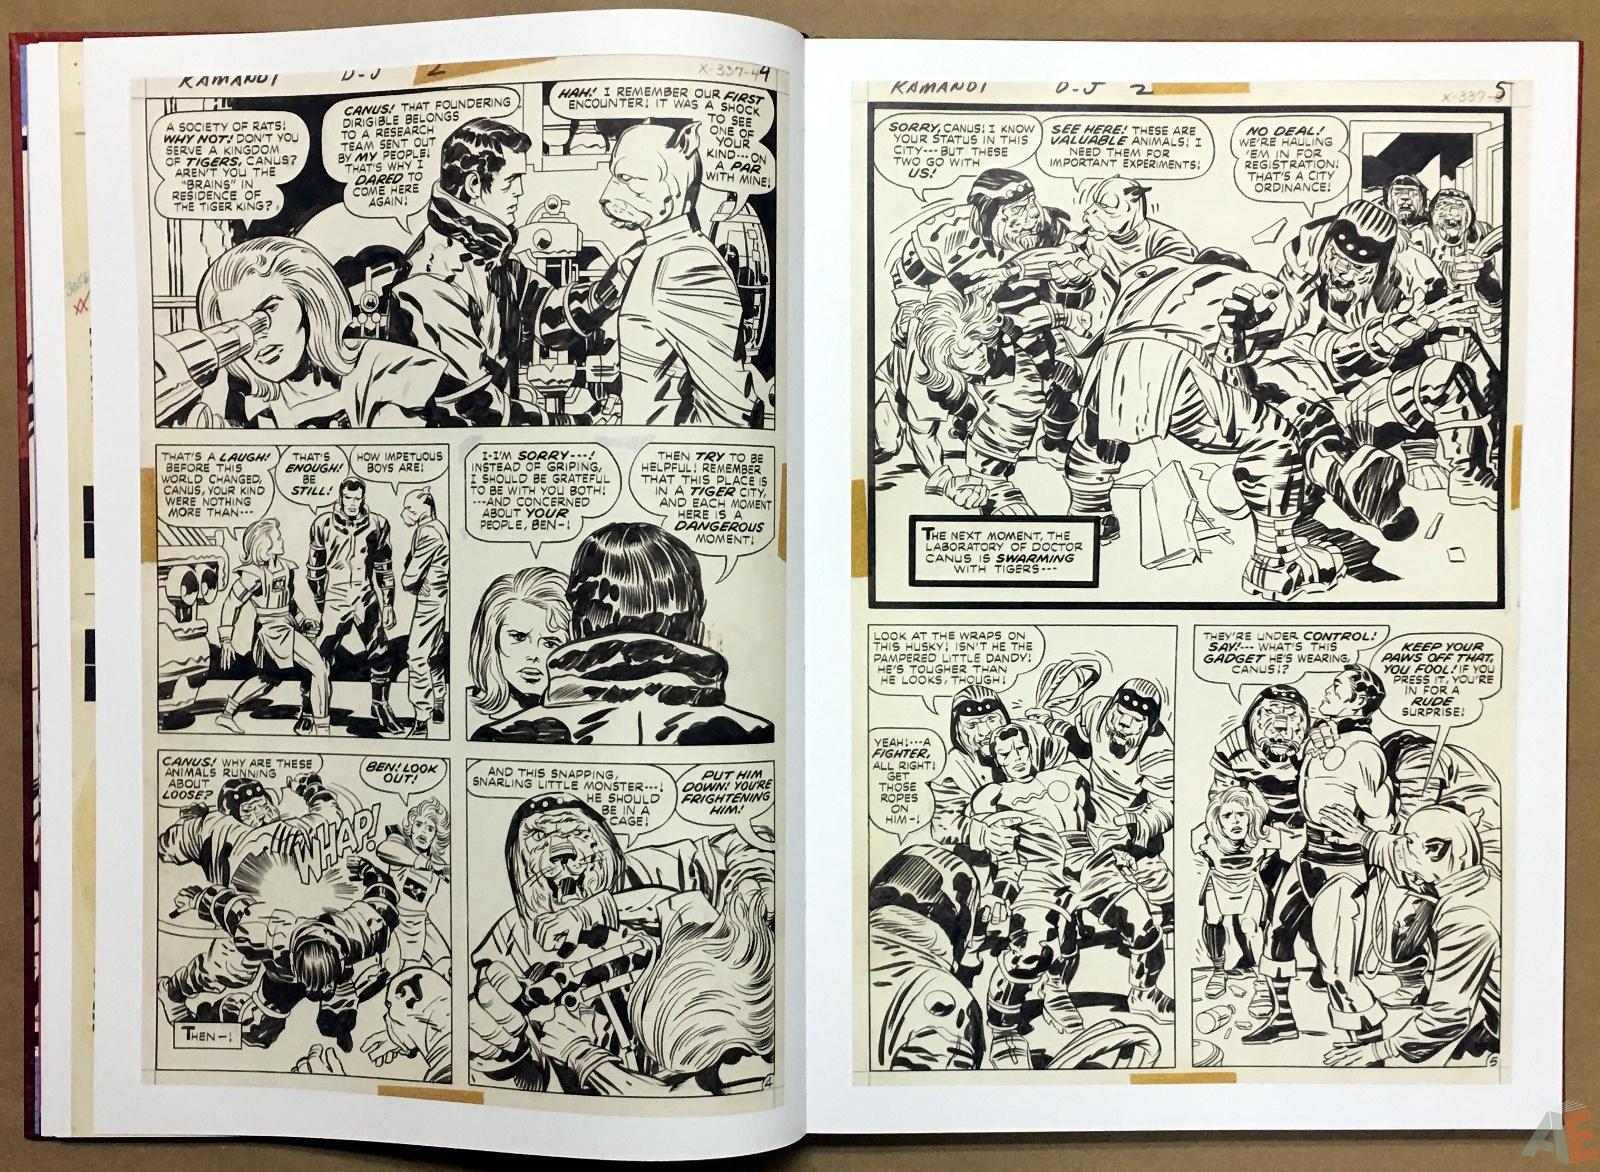 Jack Kirby Kamandi The Last Boy On Earth Artist's Edition 14